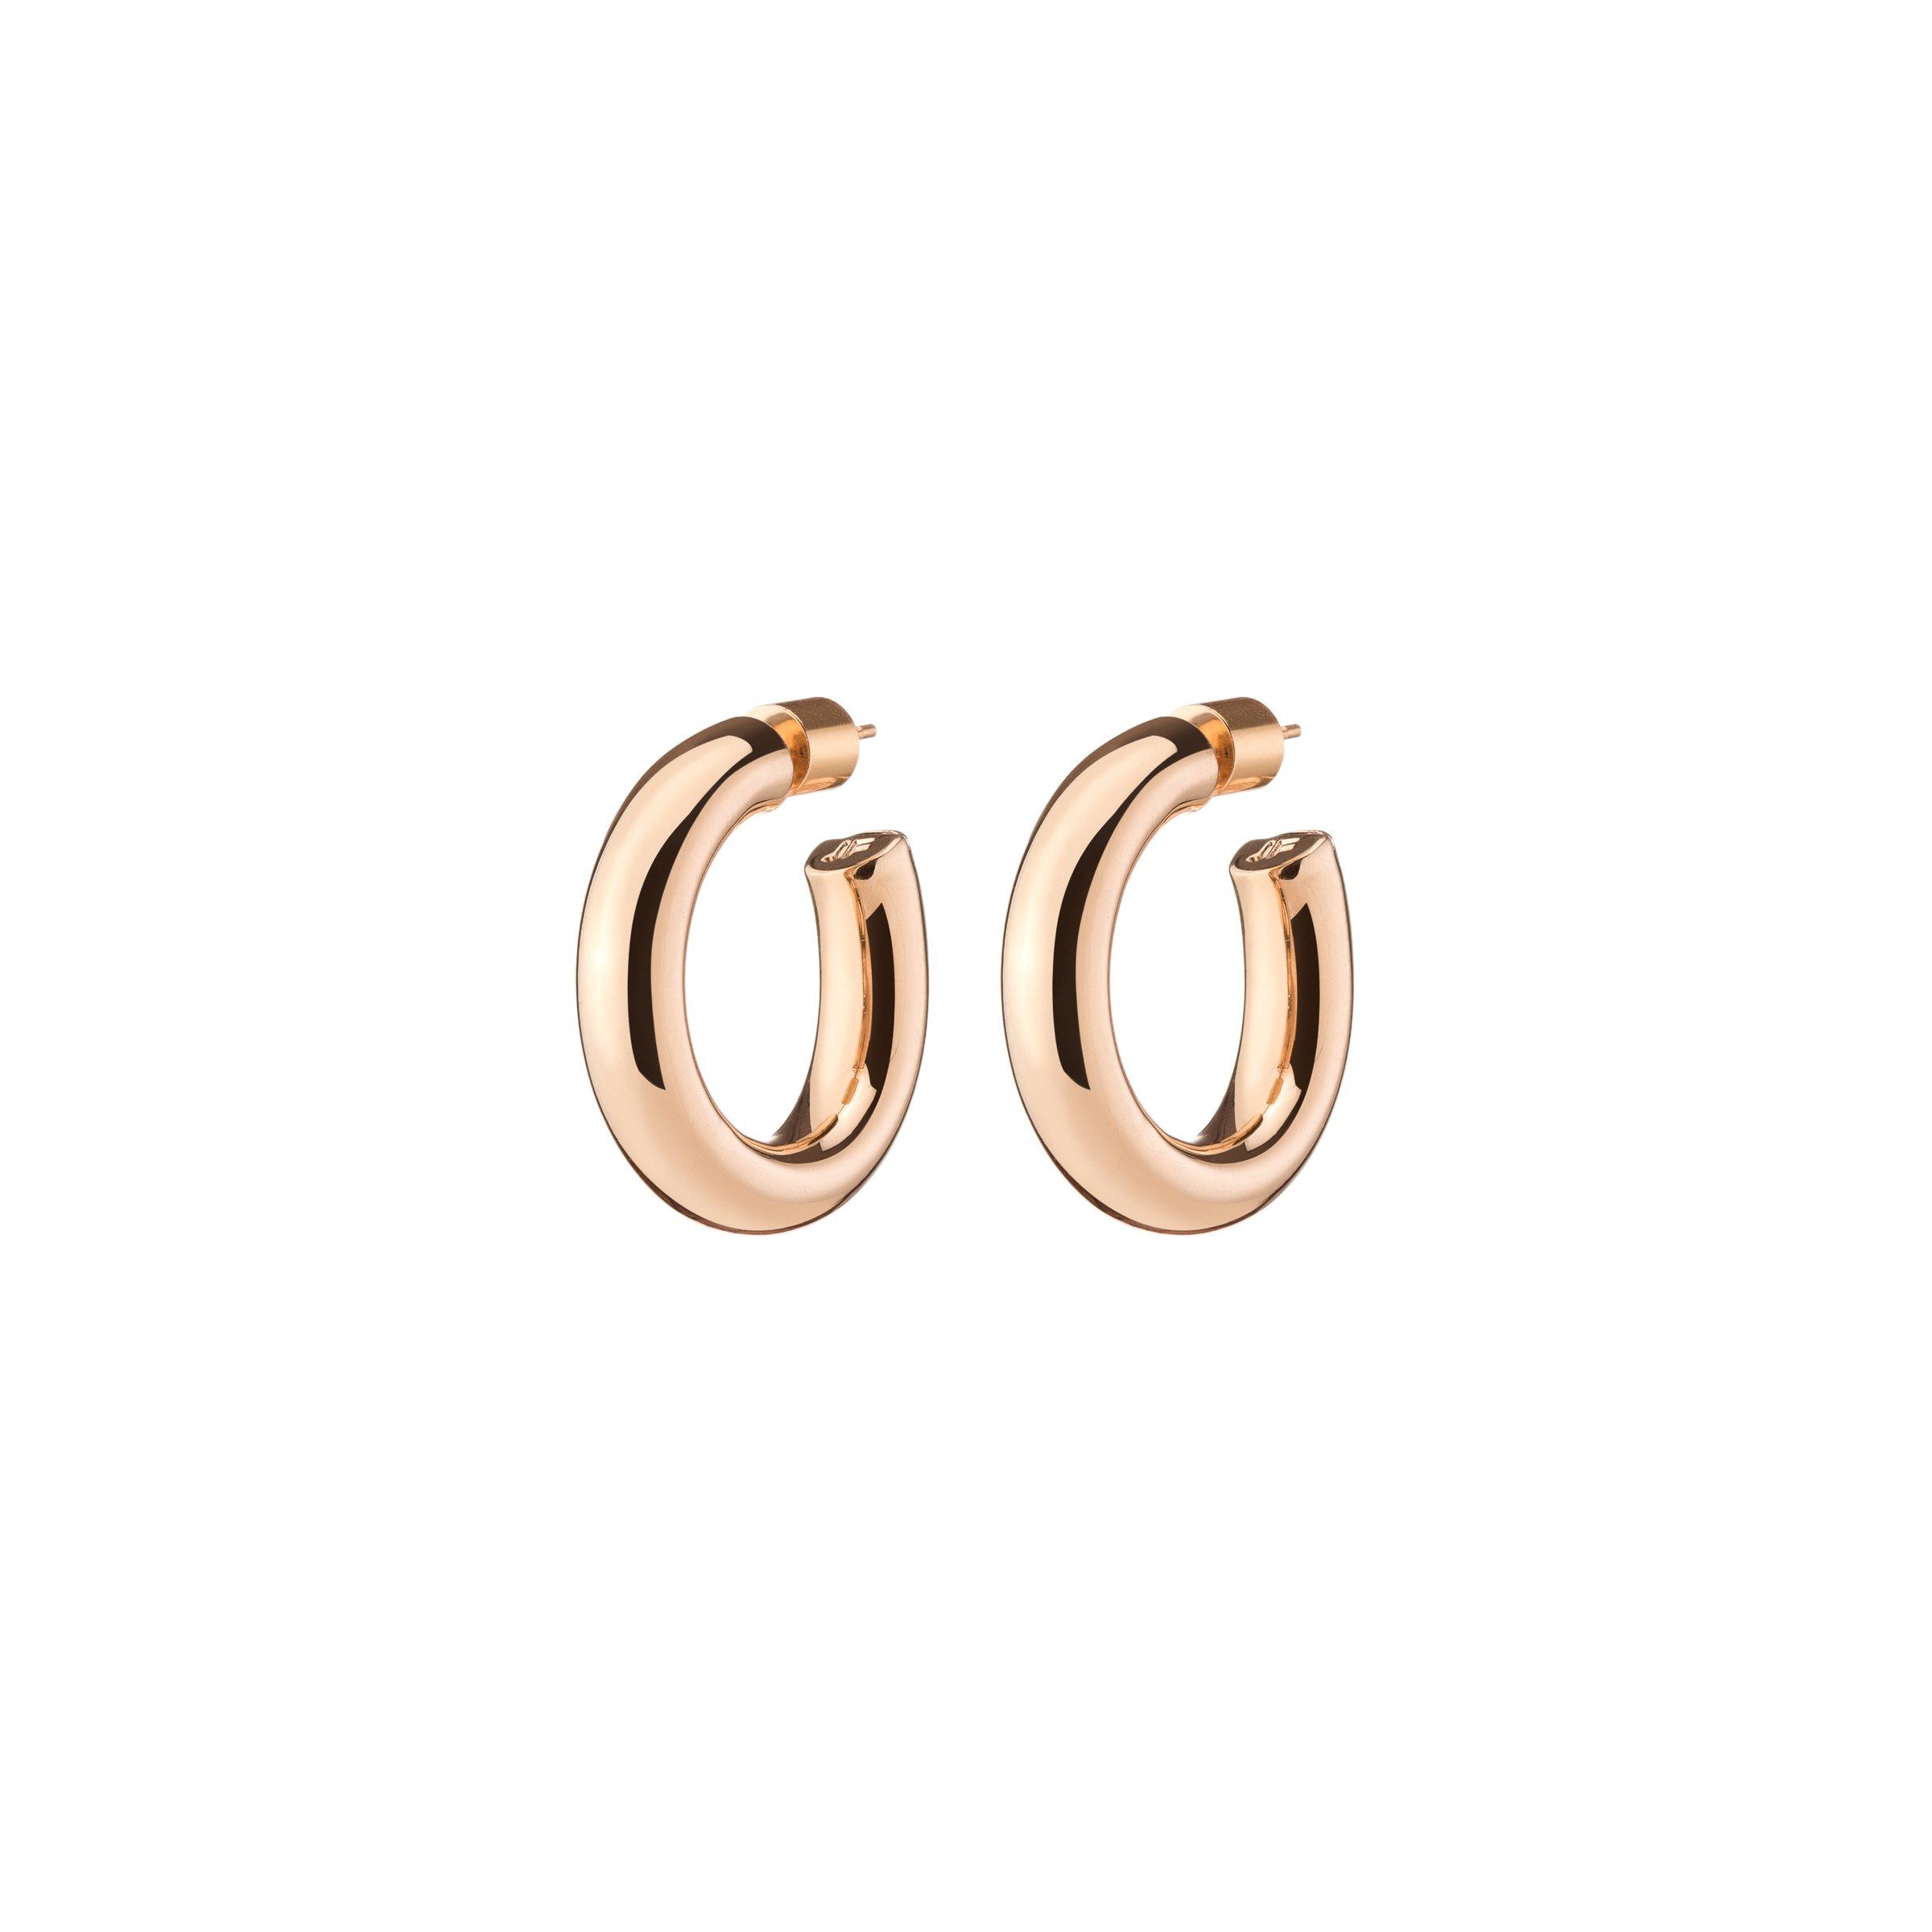 NATASHA HUGGIES by Jennifer Fisher, available on jenniferfisherjewelry.com for $195 Hailey Baldwin Jewellery Exact Product